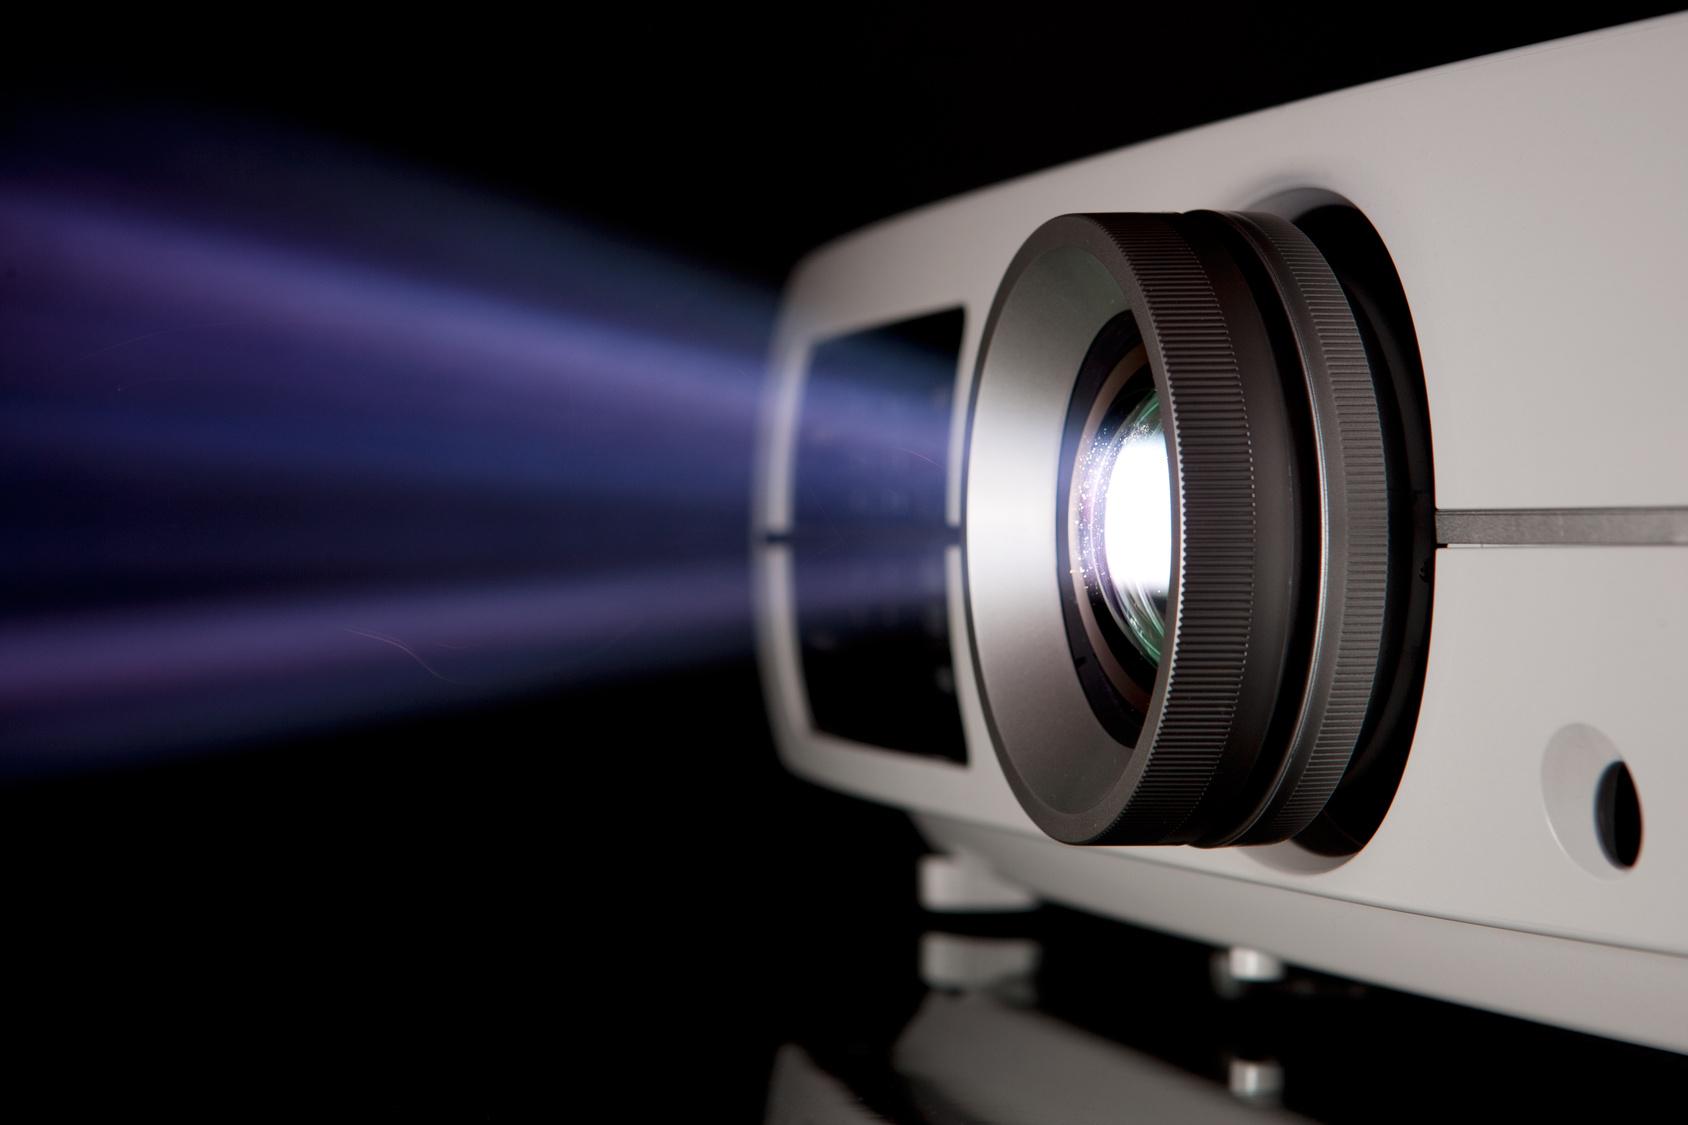 Projektionstechnik